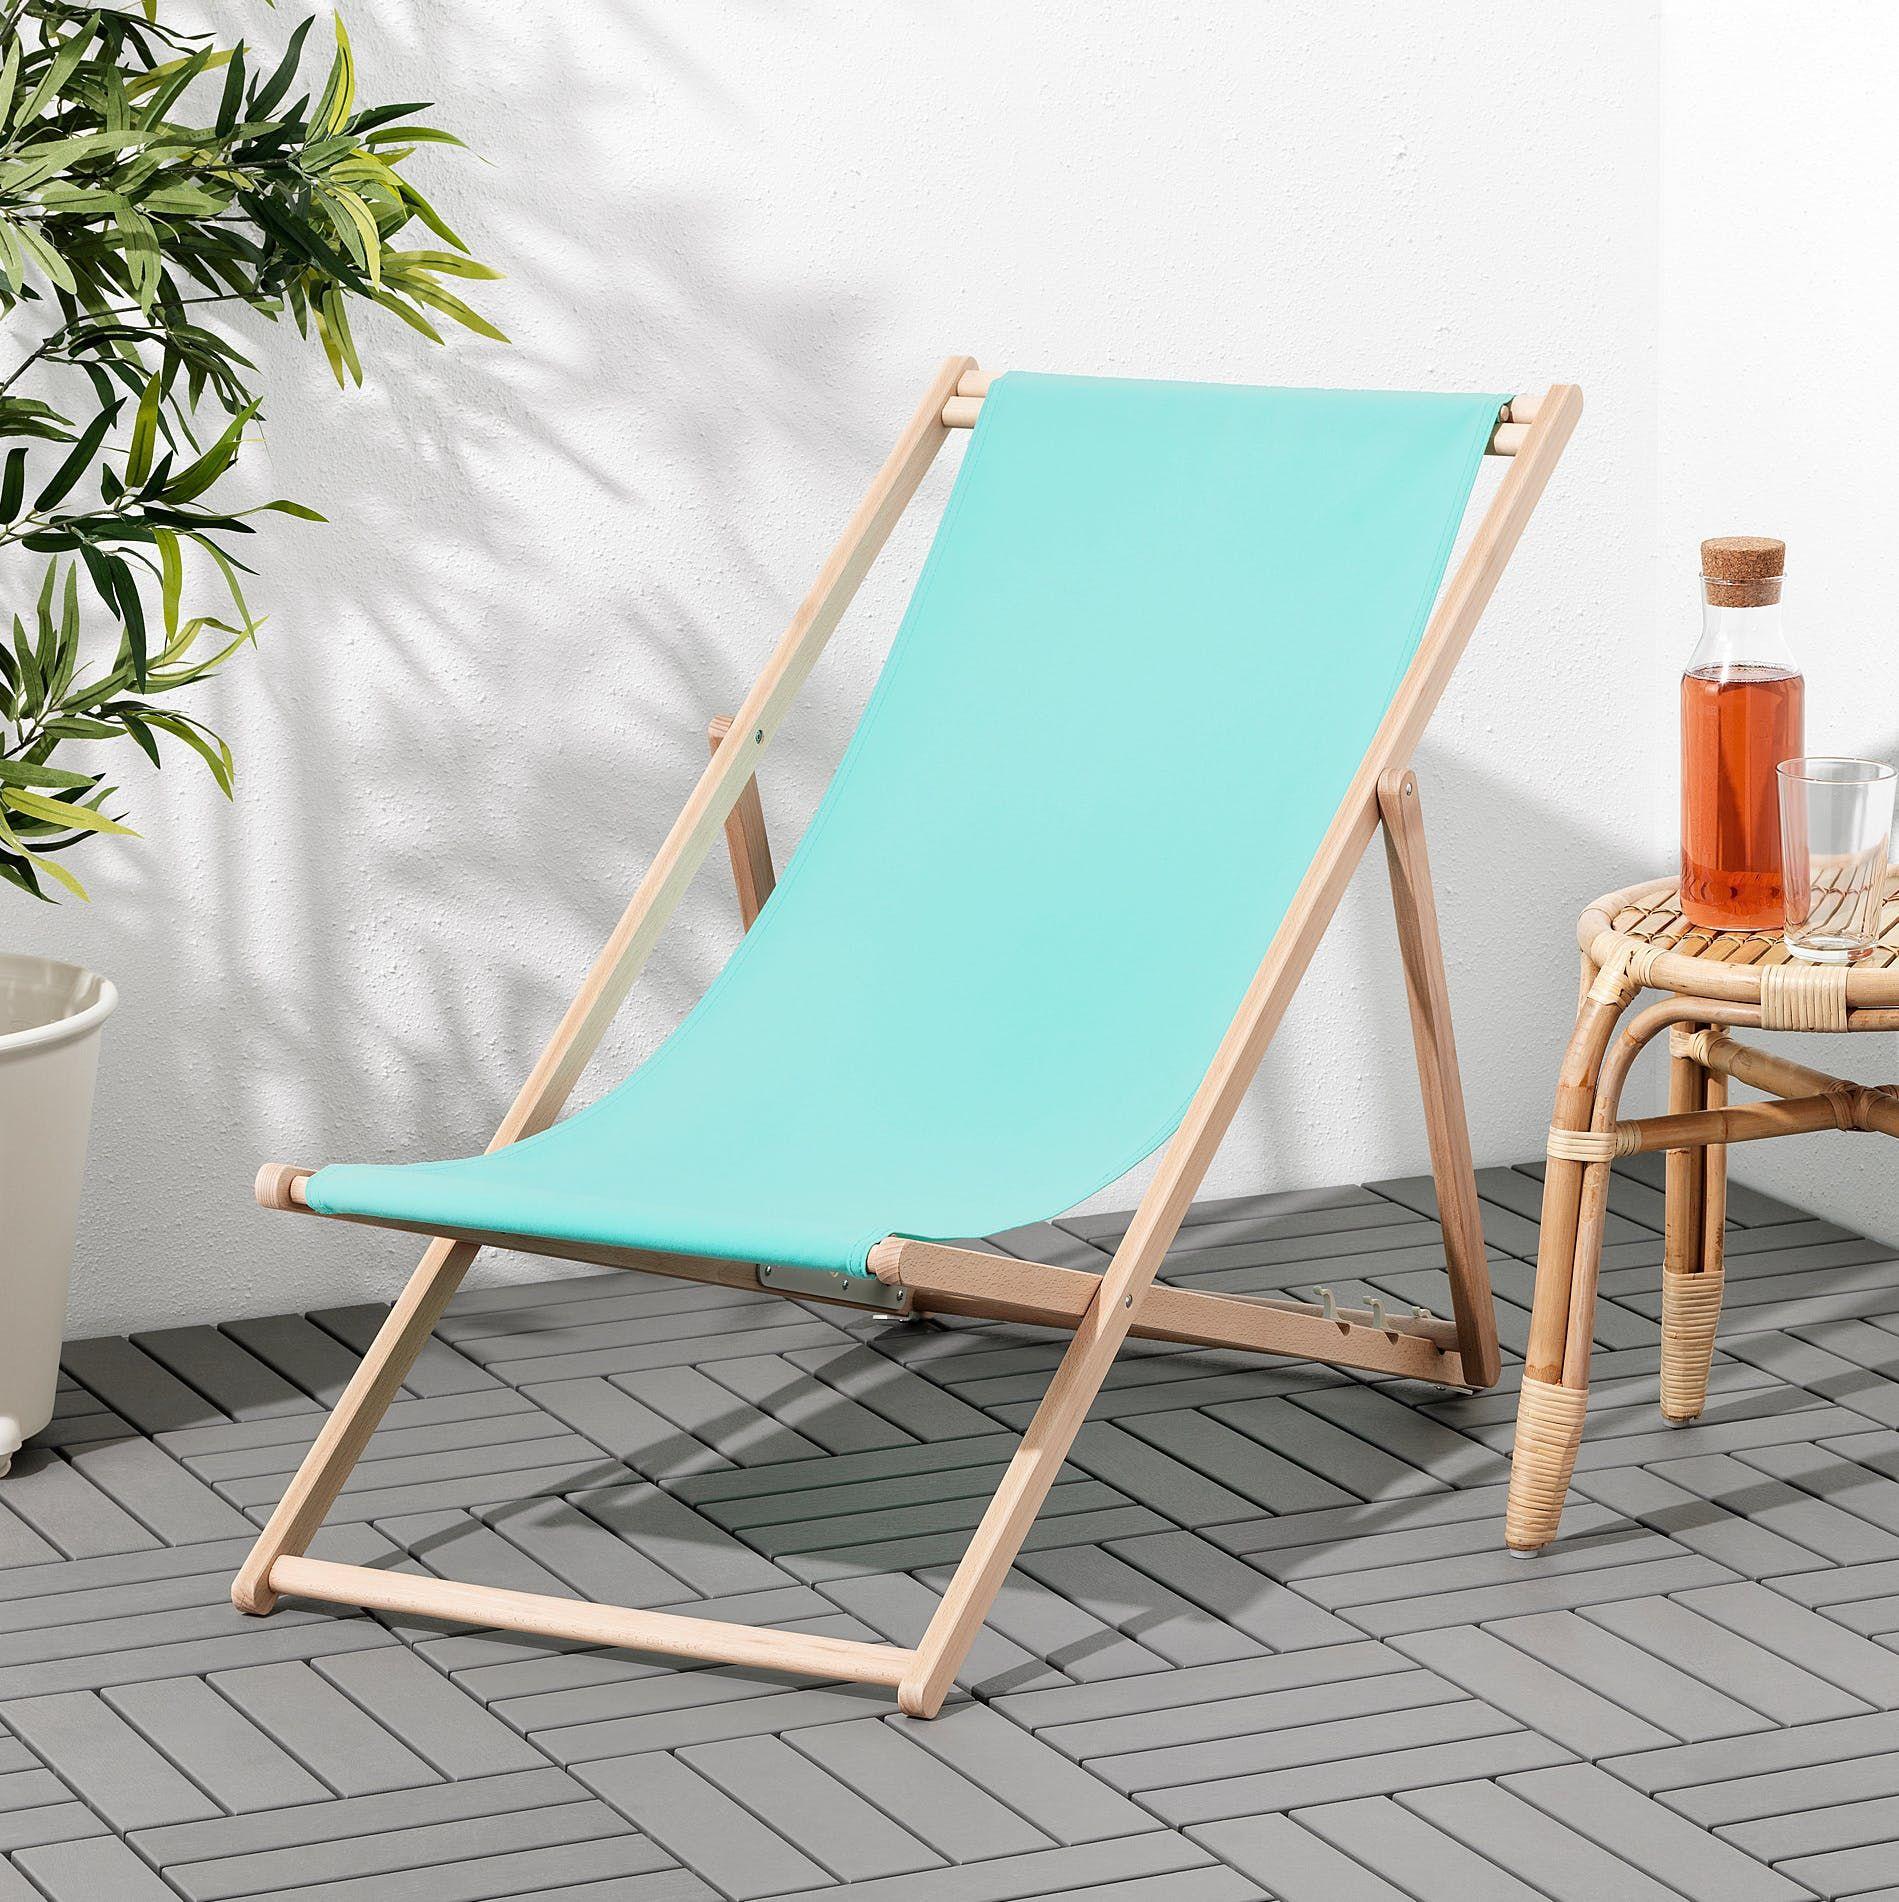 The Cutest Ikea Patio Items Under $100 You Need For Summer ... intérieur Transat Jardin Ikea